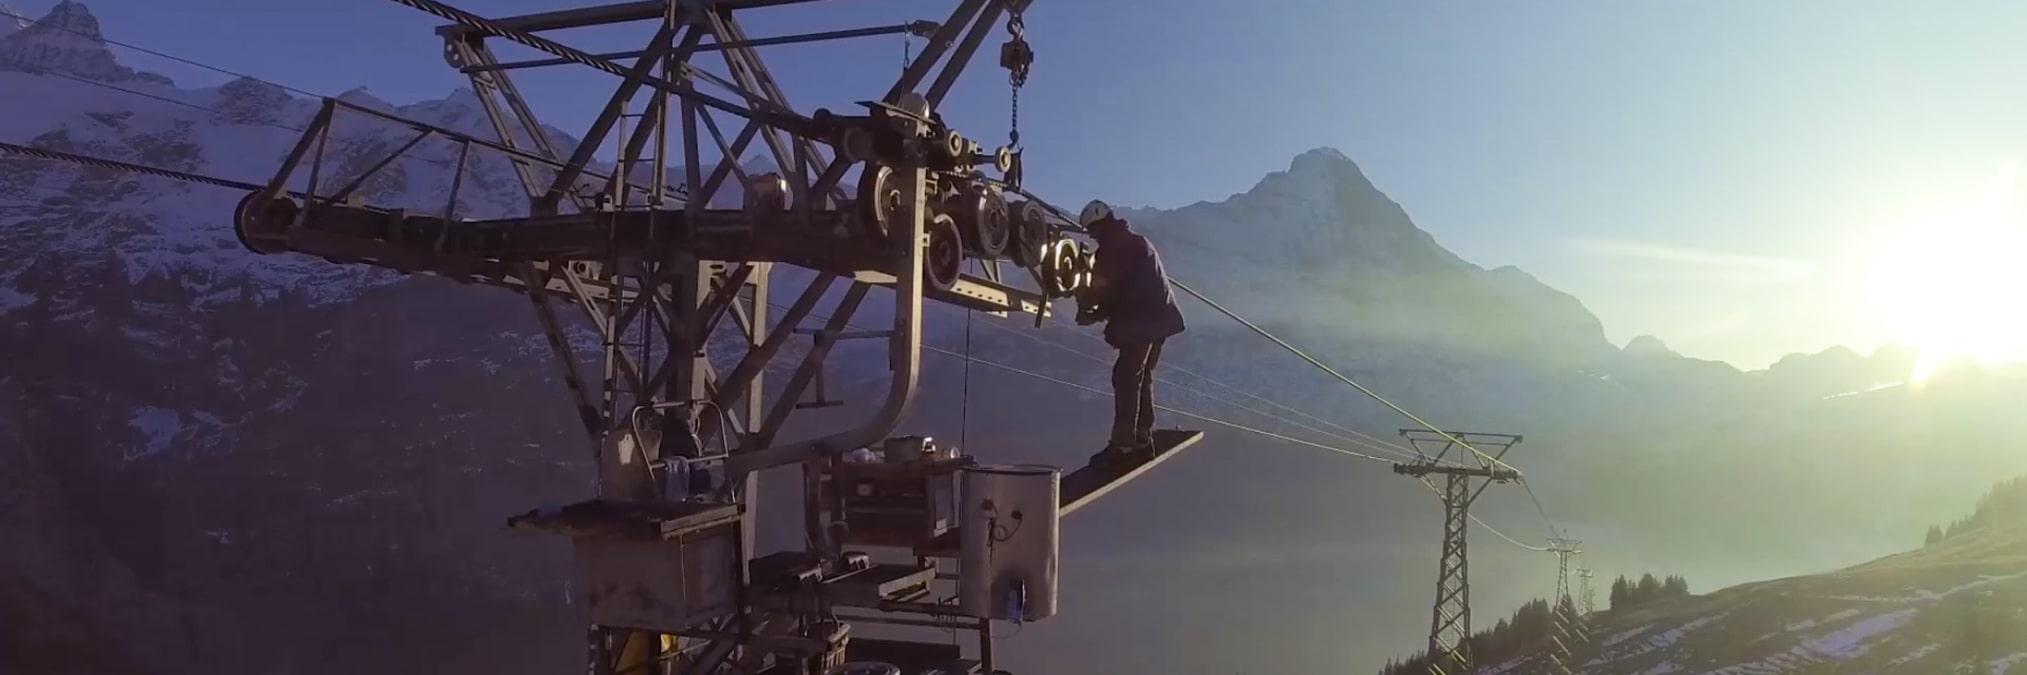 Seilbahnfachmann Seilbahnmechatroniker Jungfraubahnen